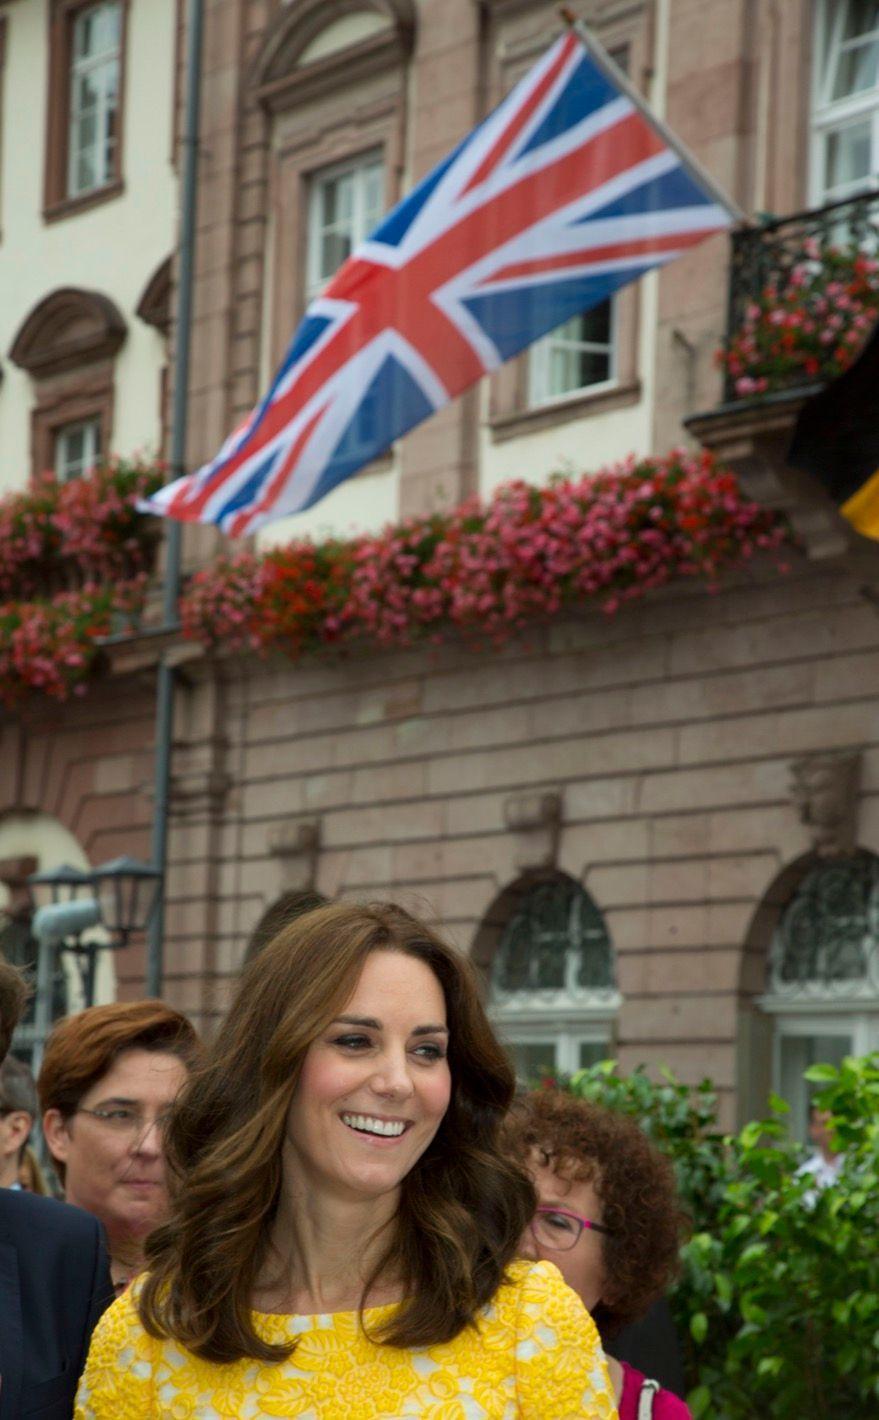 Kate Middleton Et Le Prince William En Visite Au Marché Central De Heidelberg, En Allemagne 27